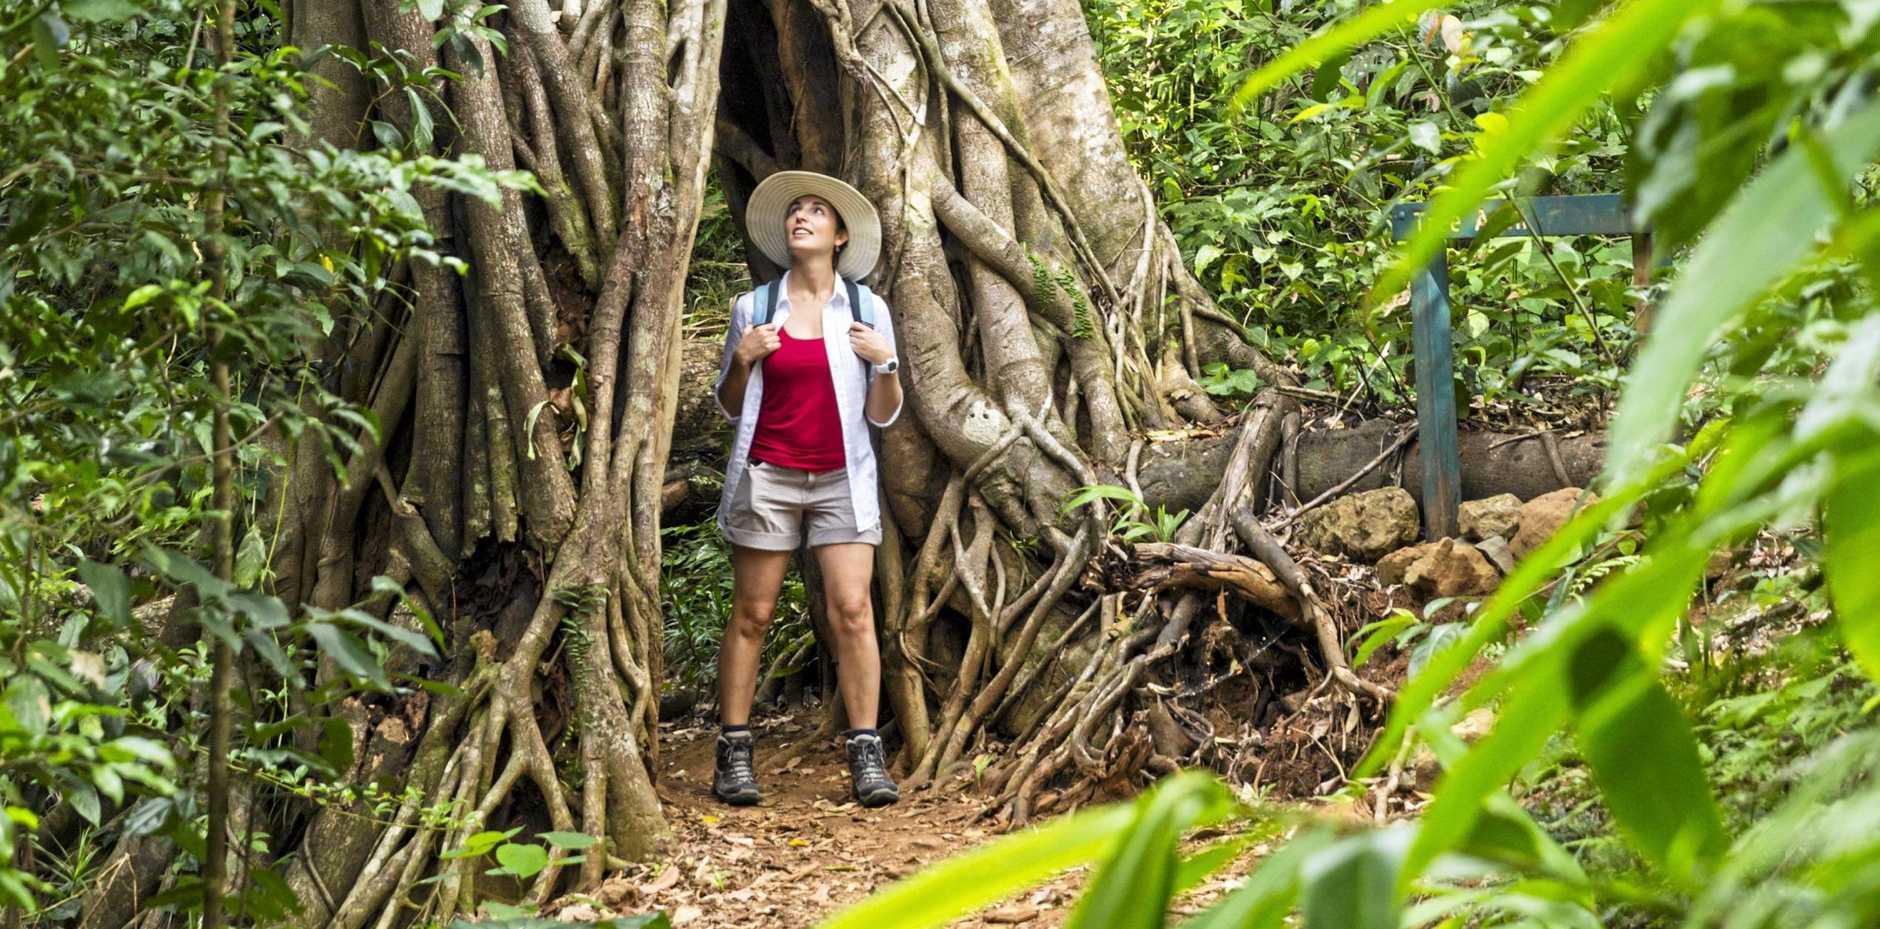 Hiker under the Strangler Fig Arch in Eungella National Park, Mackay, Queensland, Austral